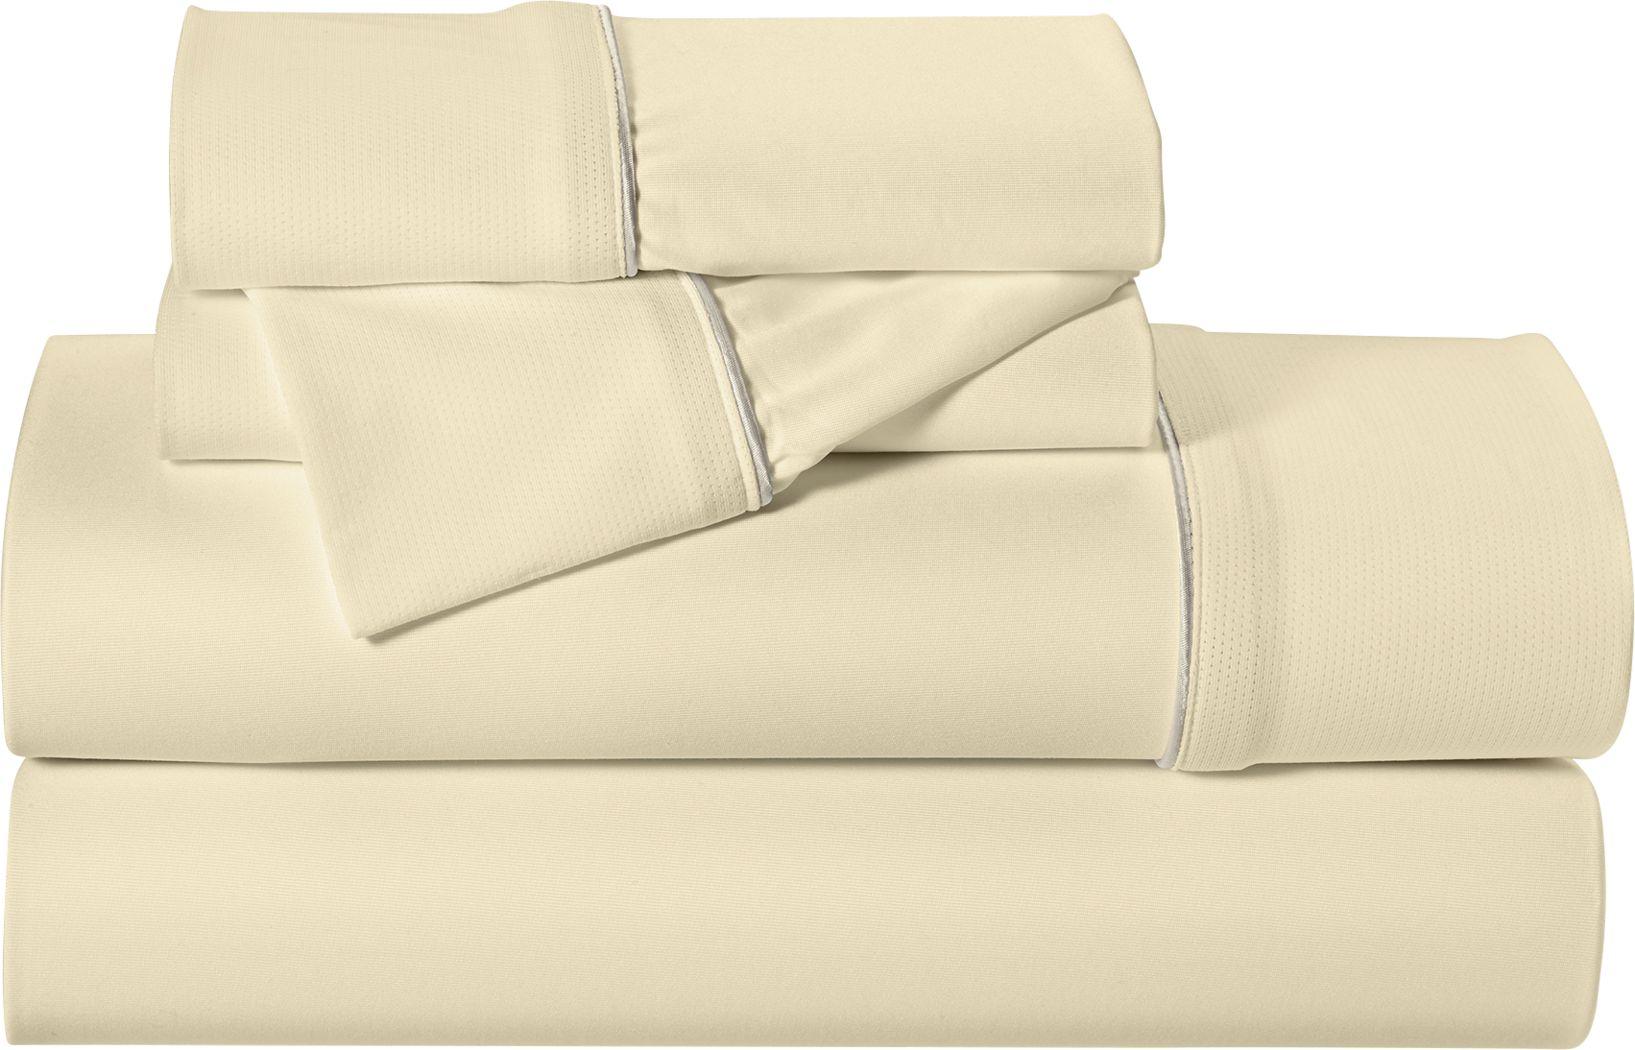 Dri-Tec Performance Champagne 3 Pc Twin XL Bed Sheet Set